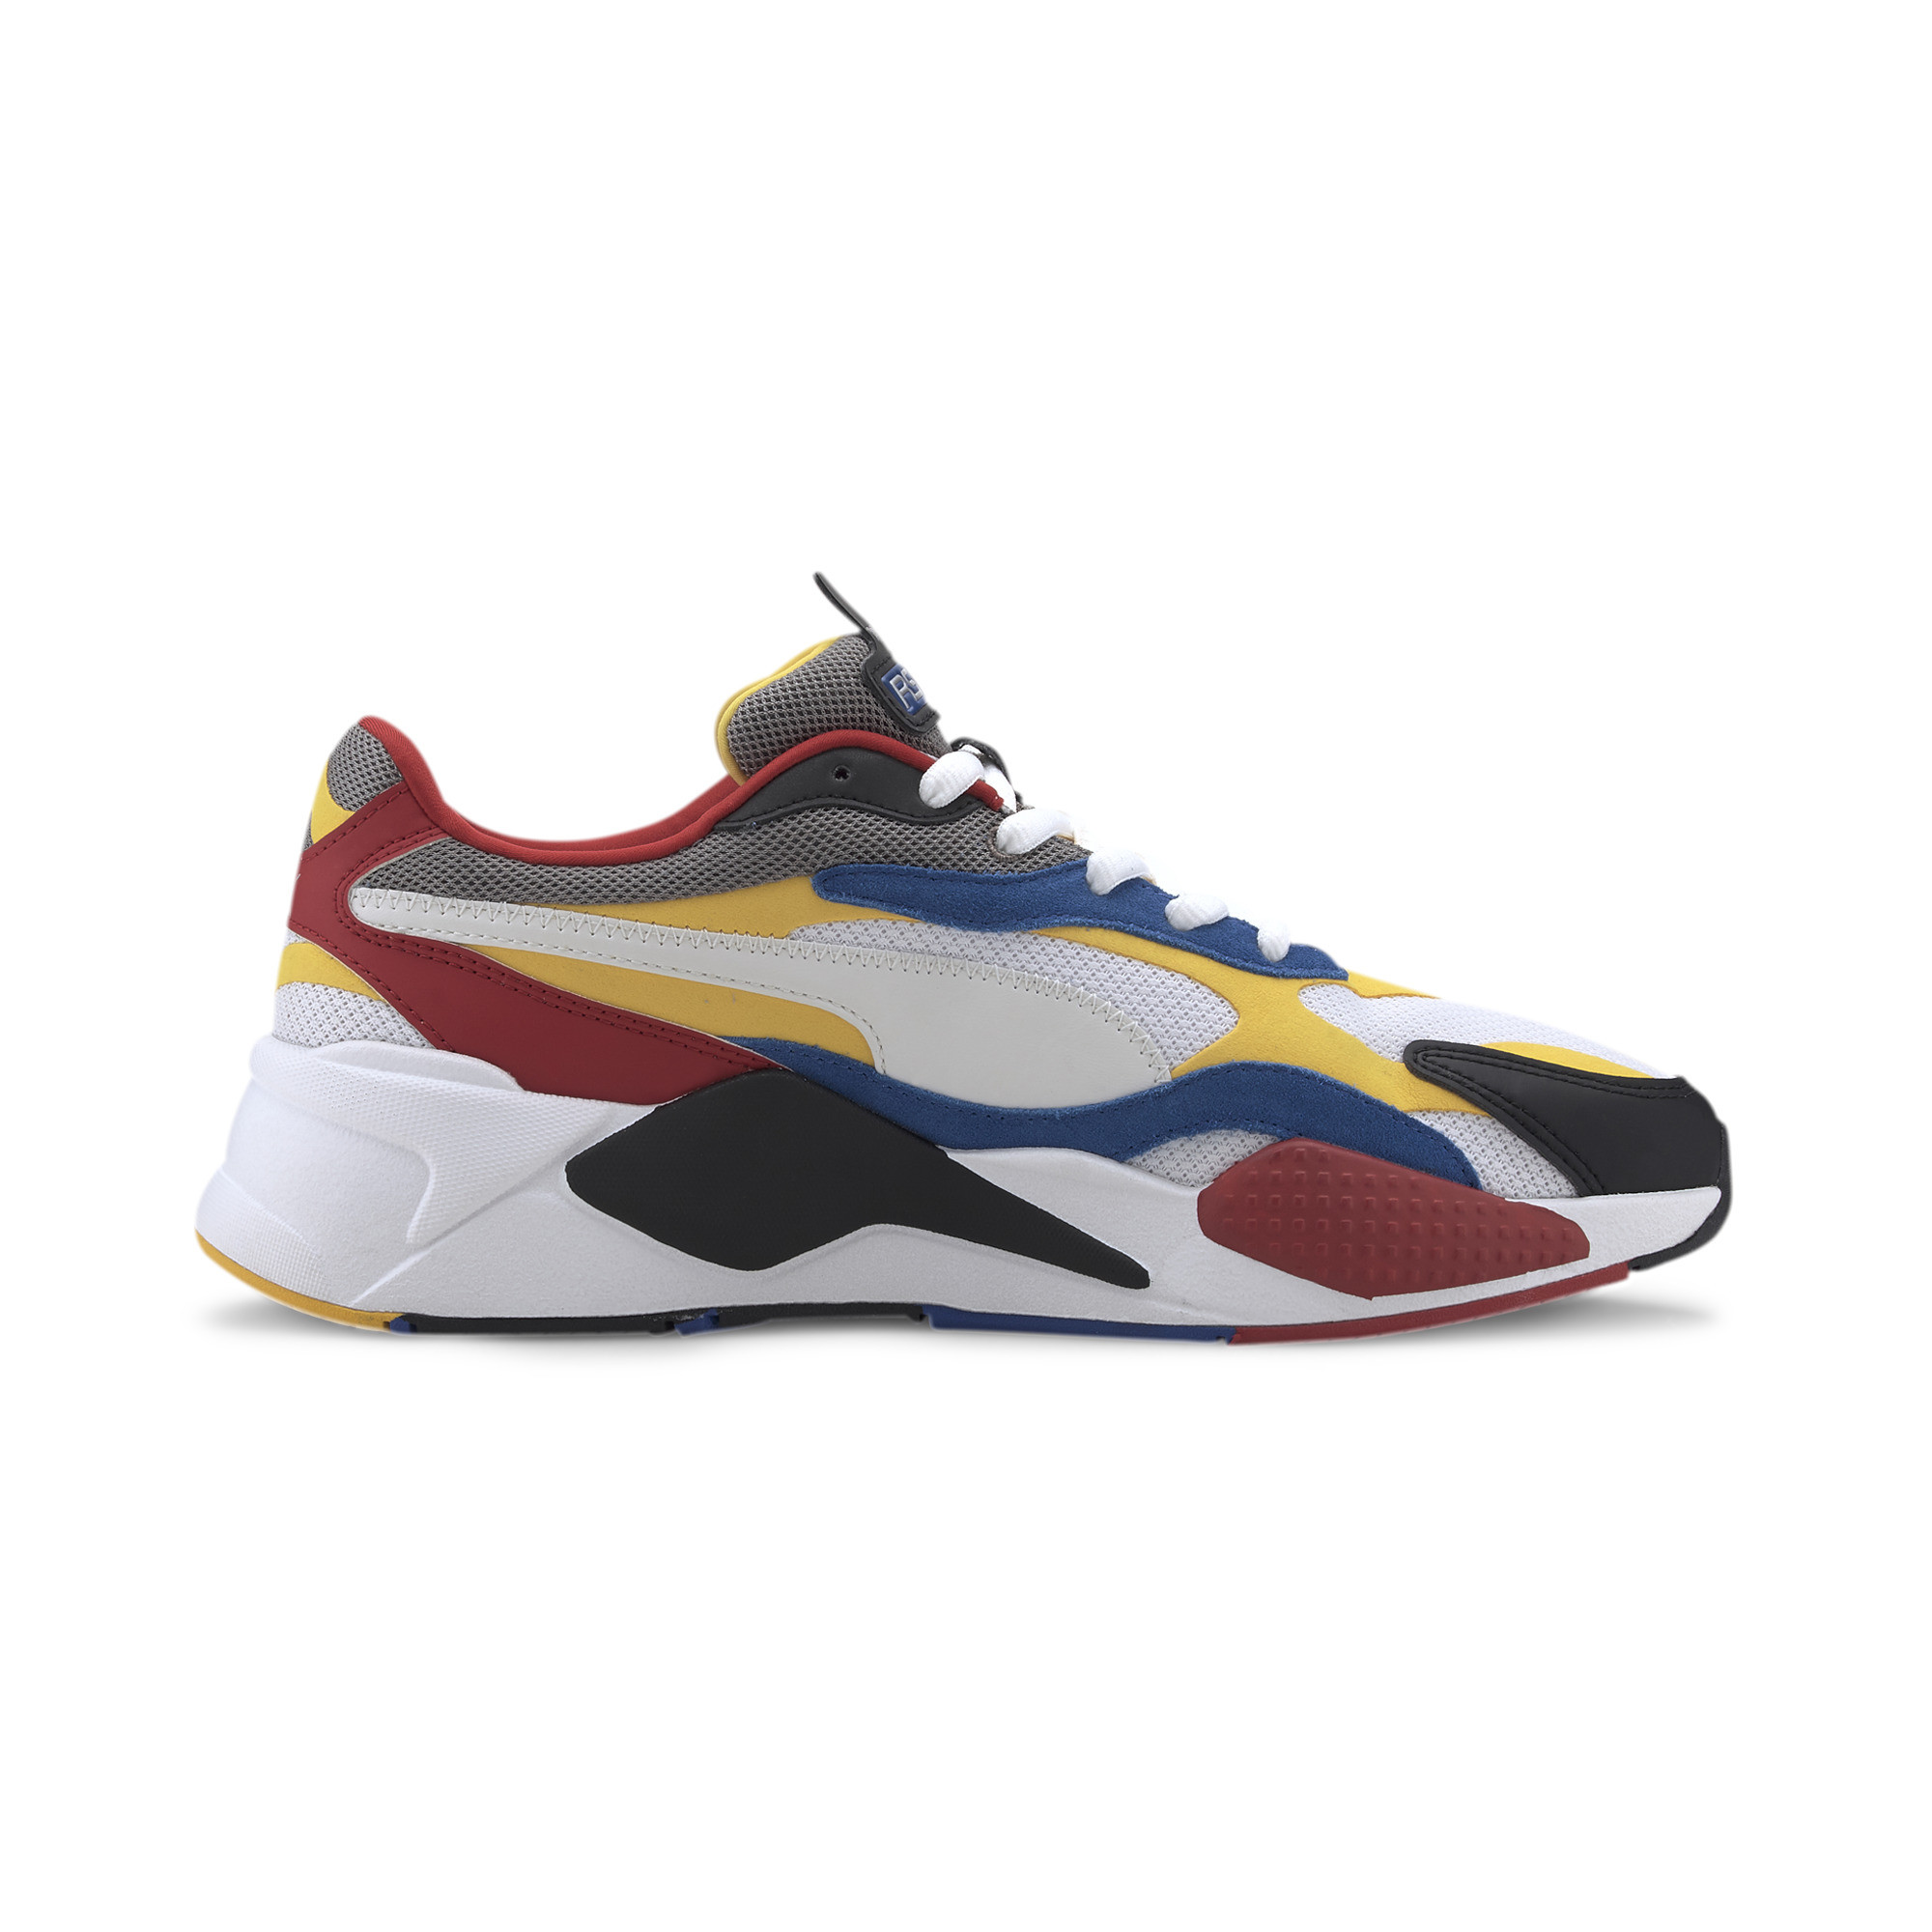 PUMA-Men-039-s-RS-X-Puzzle-Sneakers thumbnail 32